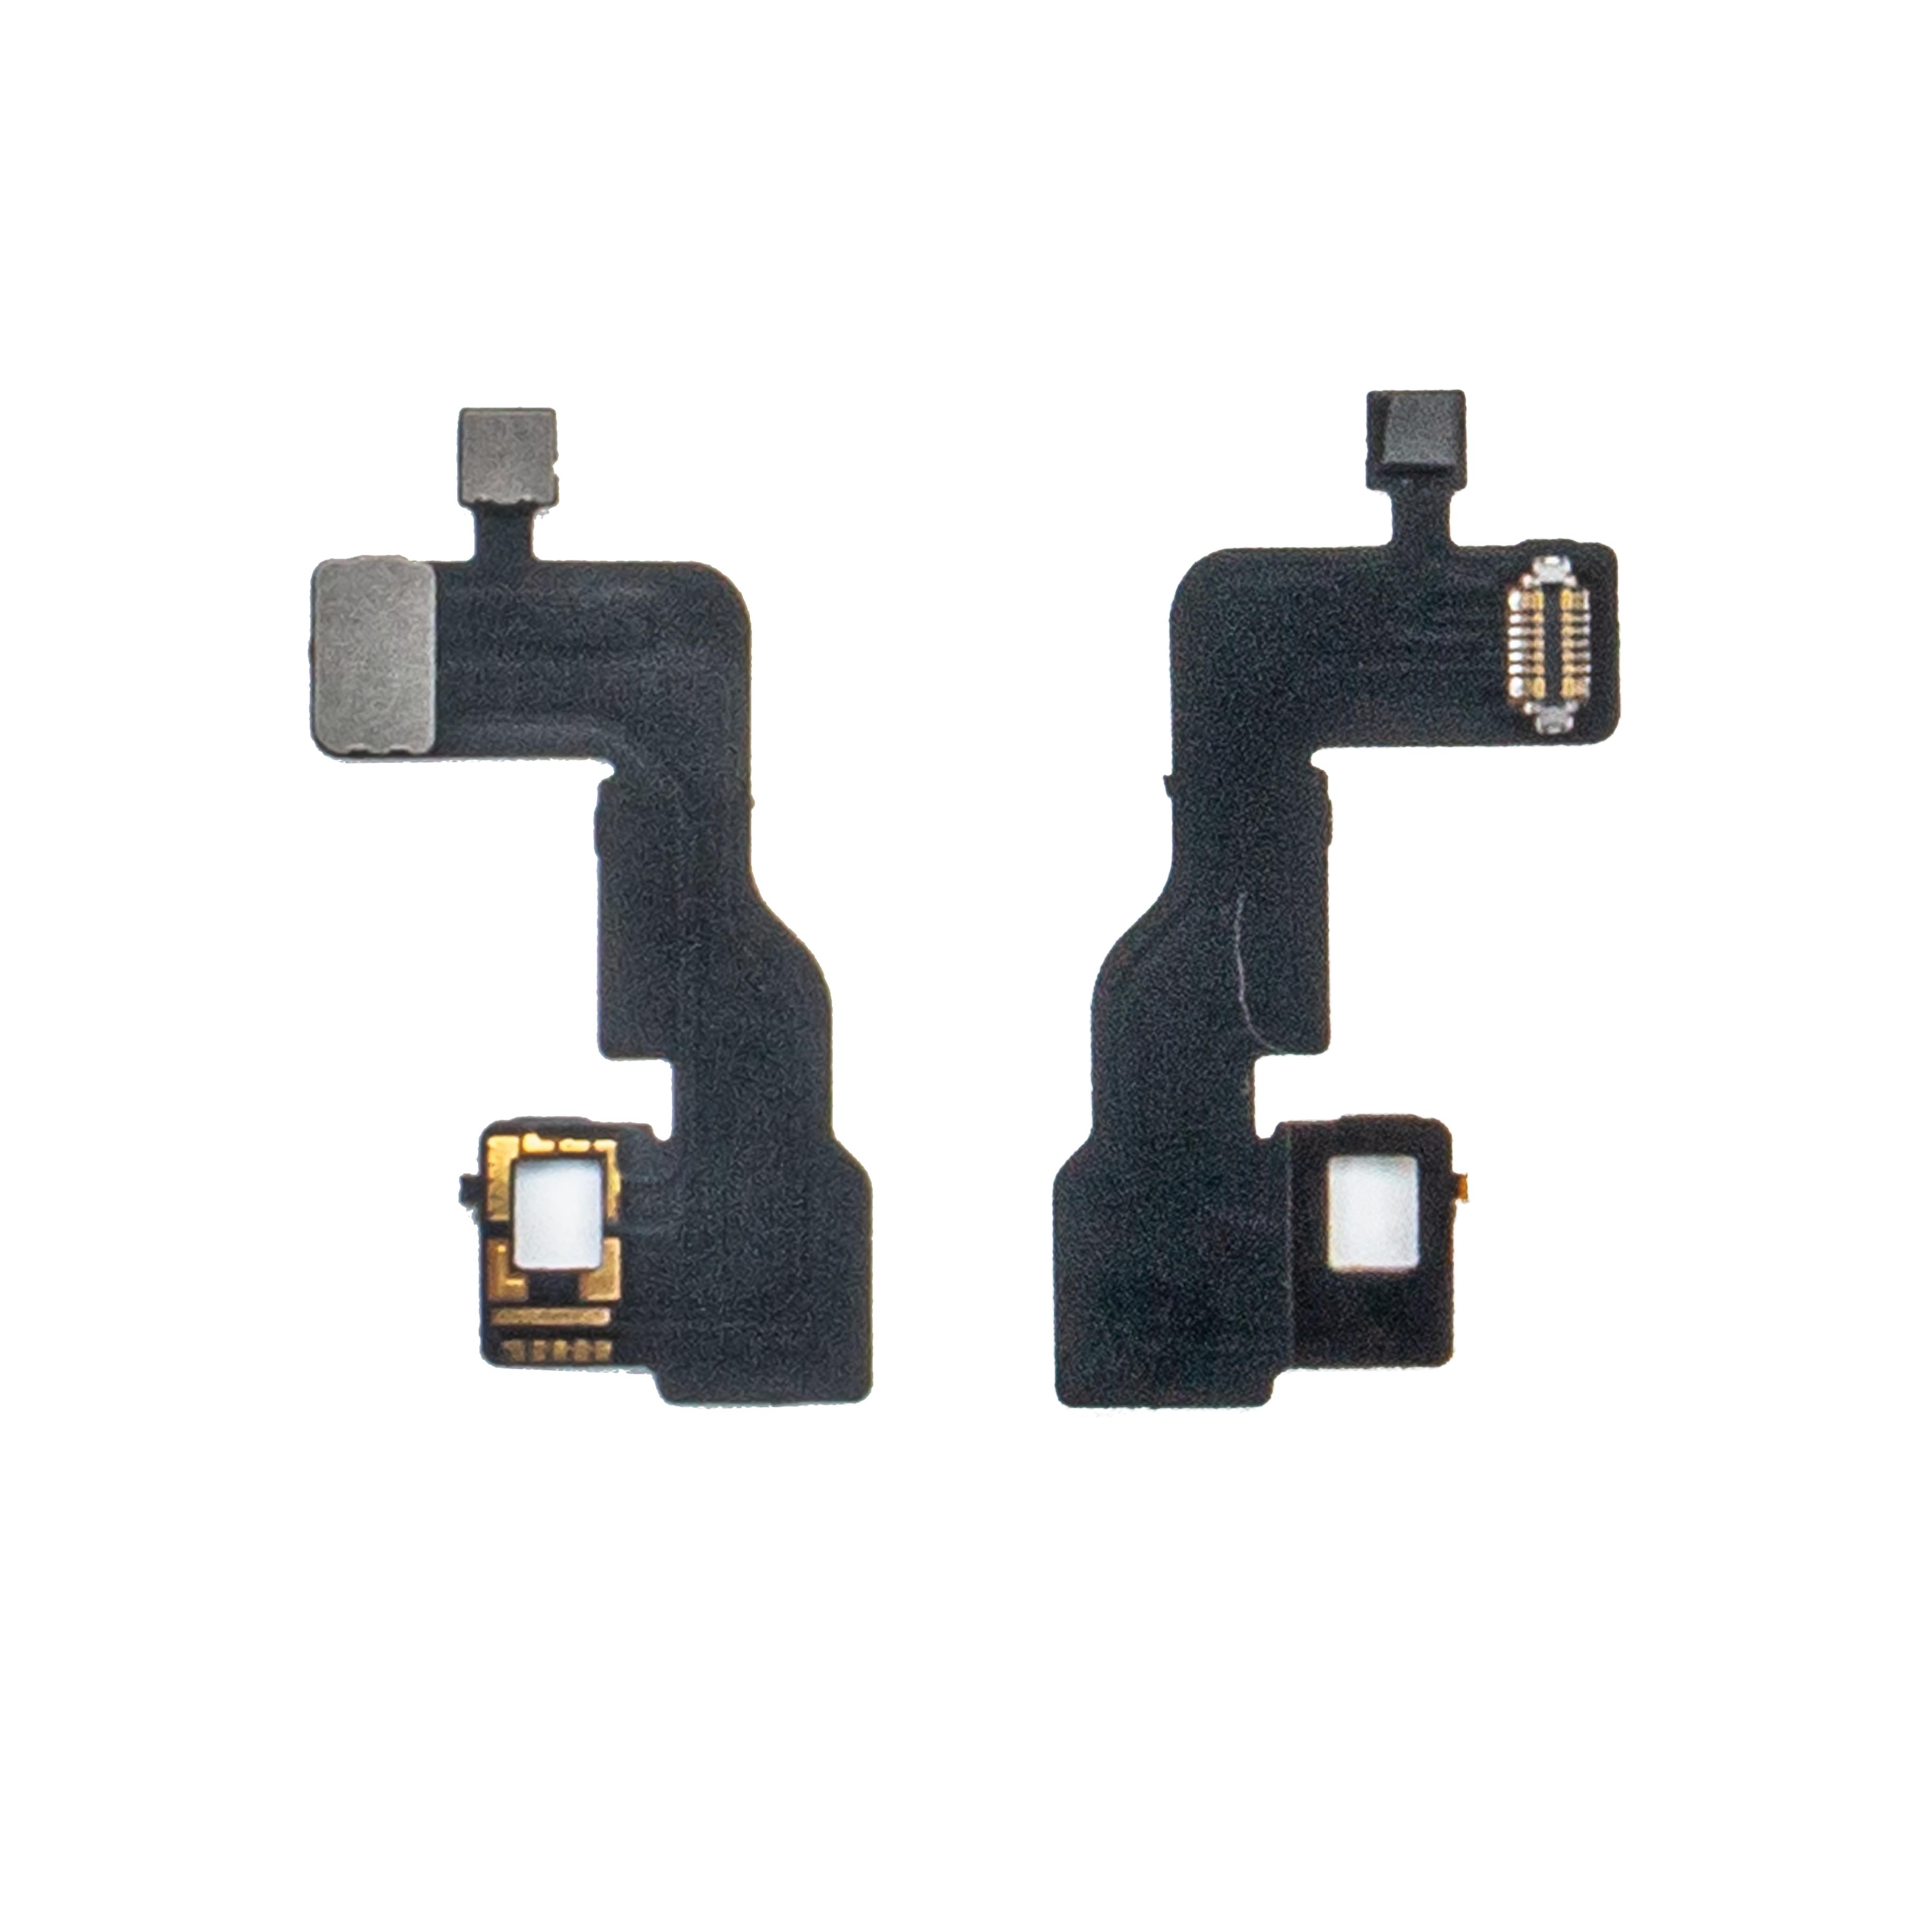 JC مبرمج Pro1000S ID الوجه الكابلات المرنة نقطة العارض خاص كابل للهاتف XR ID الوجه إصلاح 1/5/10/20 PCS